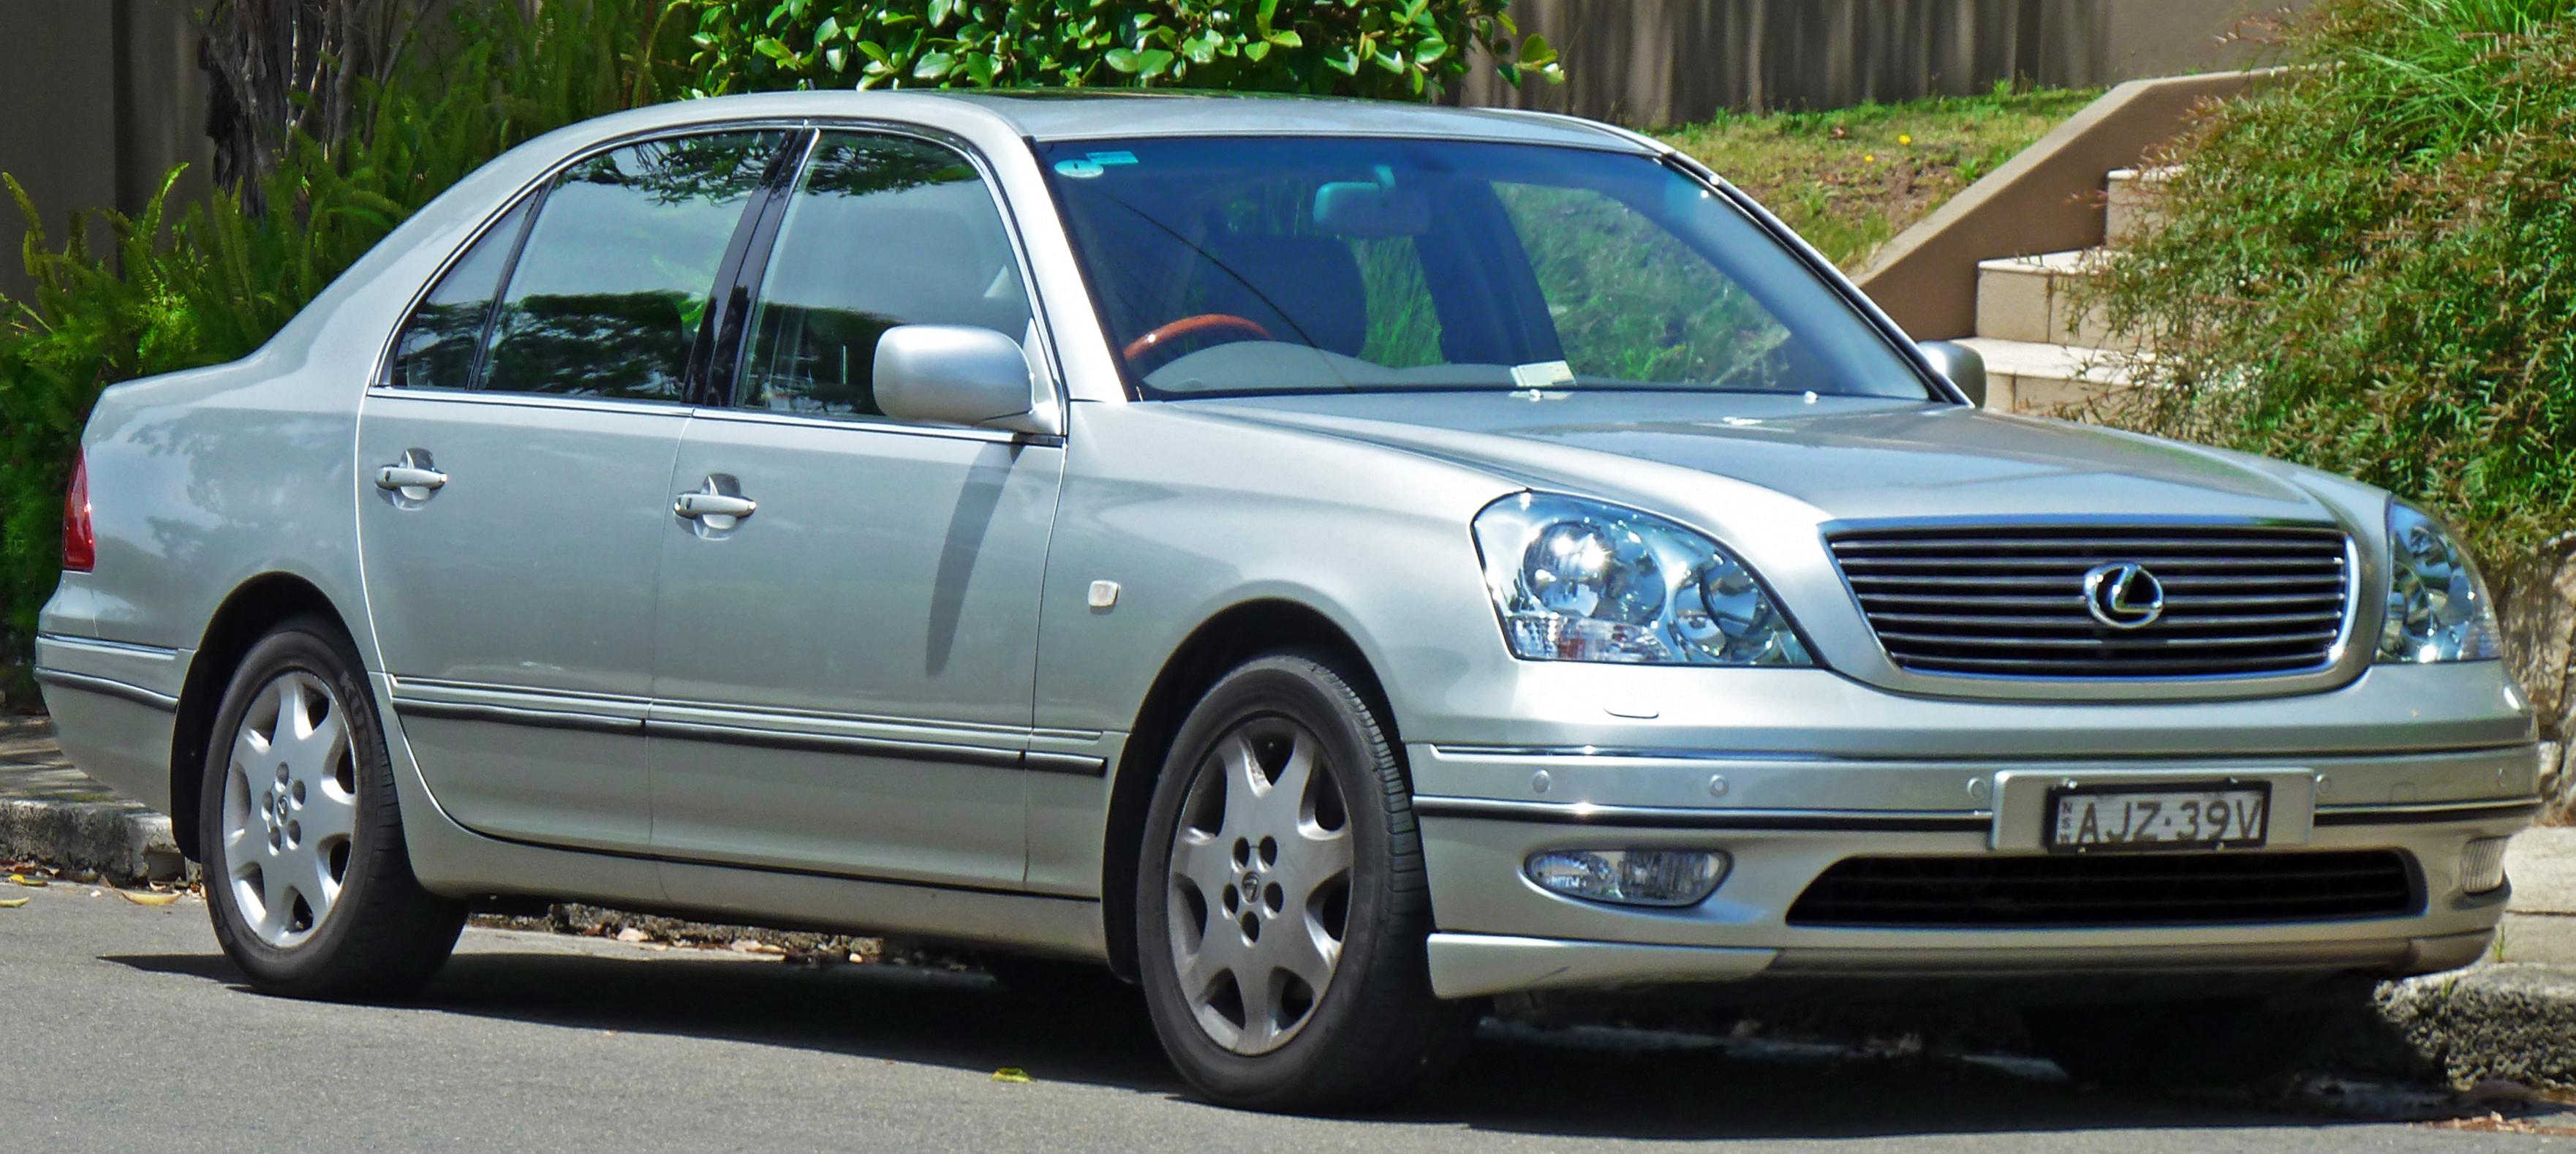 File 2000 2003 Lexus Ls 430 Ucf30r Sedan 2011 01 05